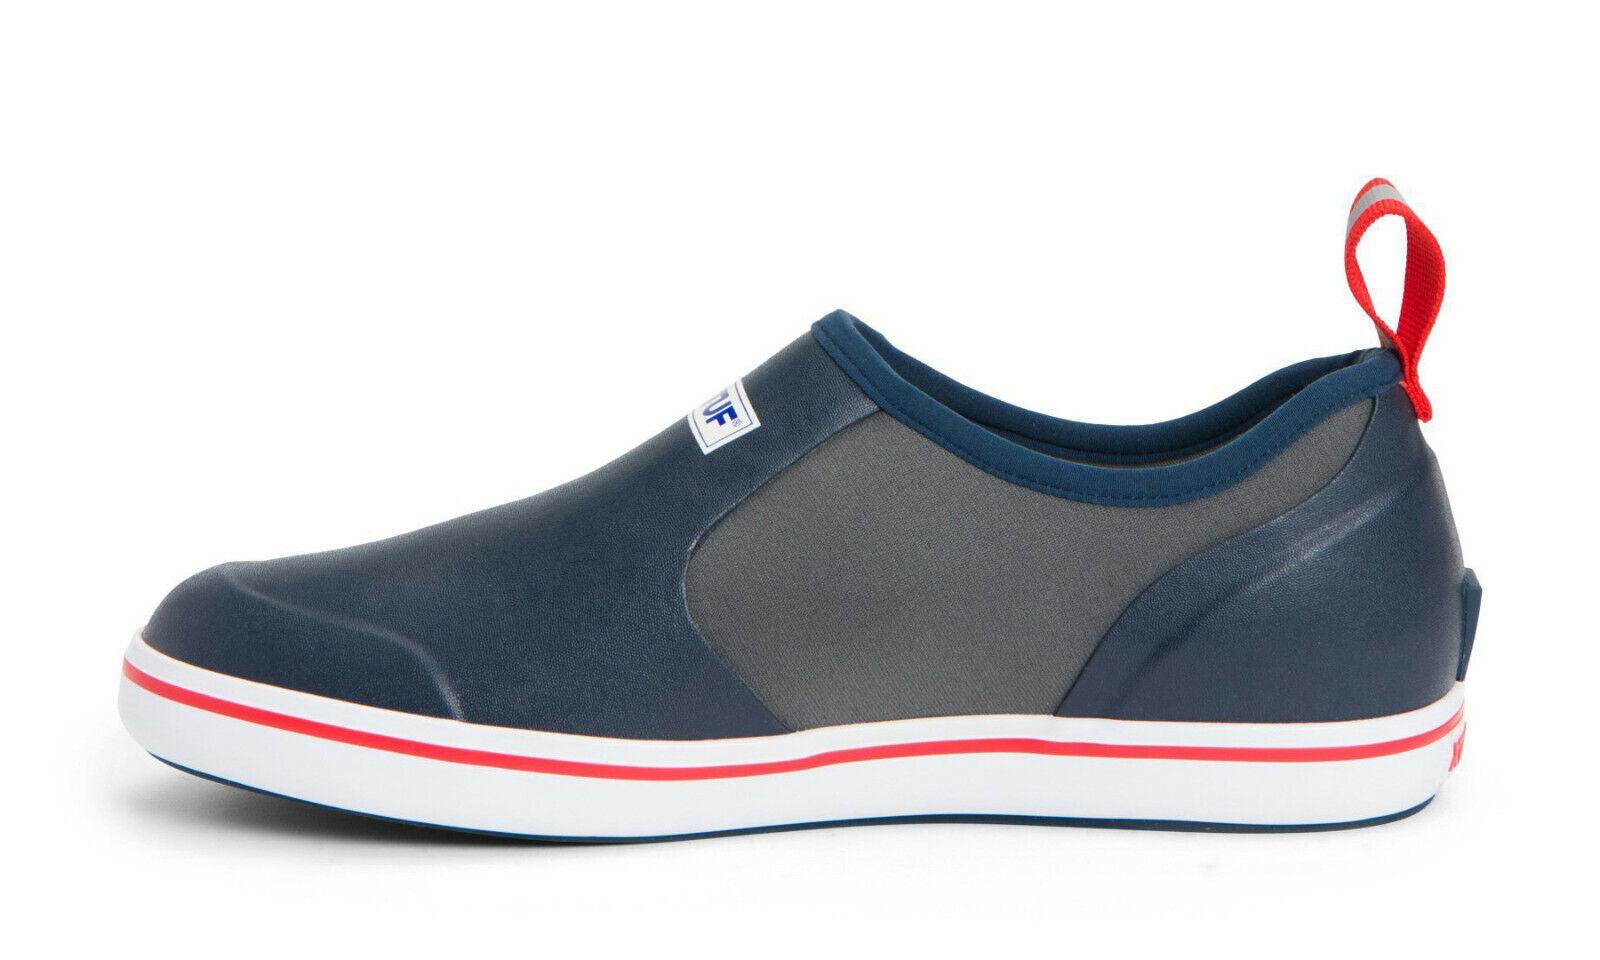 XTRATUF para hombres Calzado Sin Cordones Cubierta Impermeable (Azul marino)